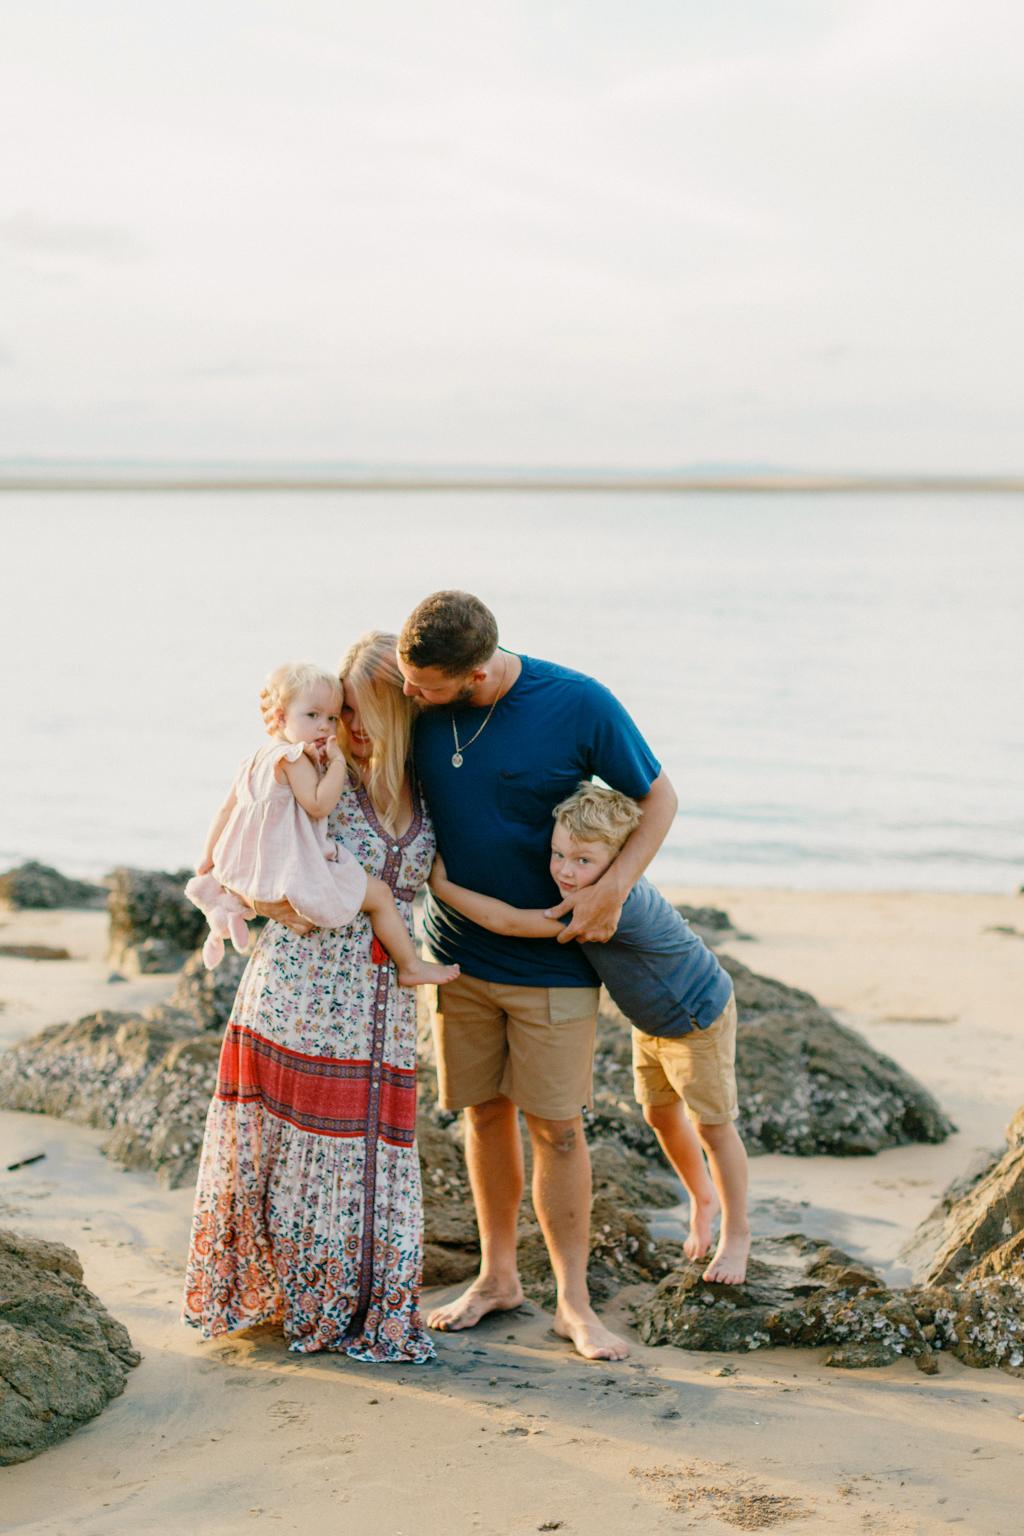 sunshin coast family photography-32.JPG